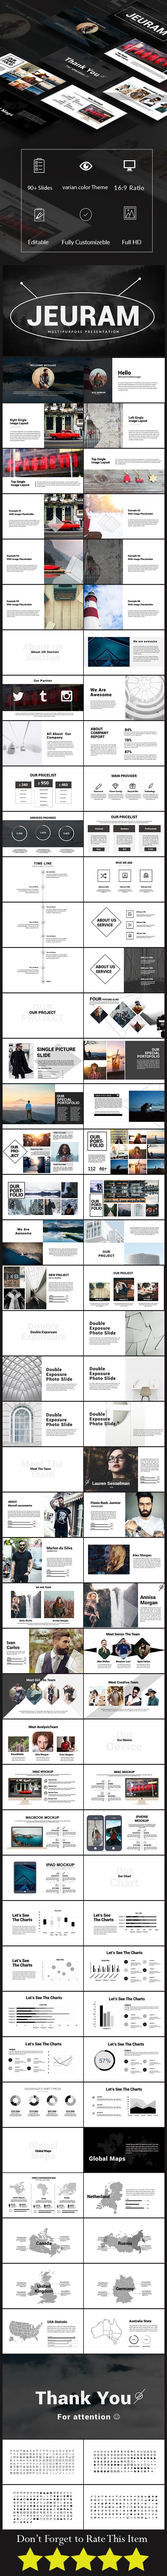 Jeuram Multipurpose Presentation - PowerPoint Templates Presentation Templates